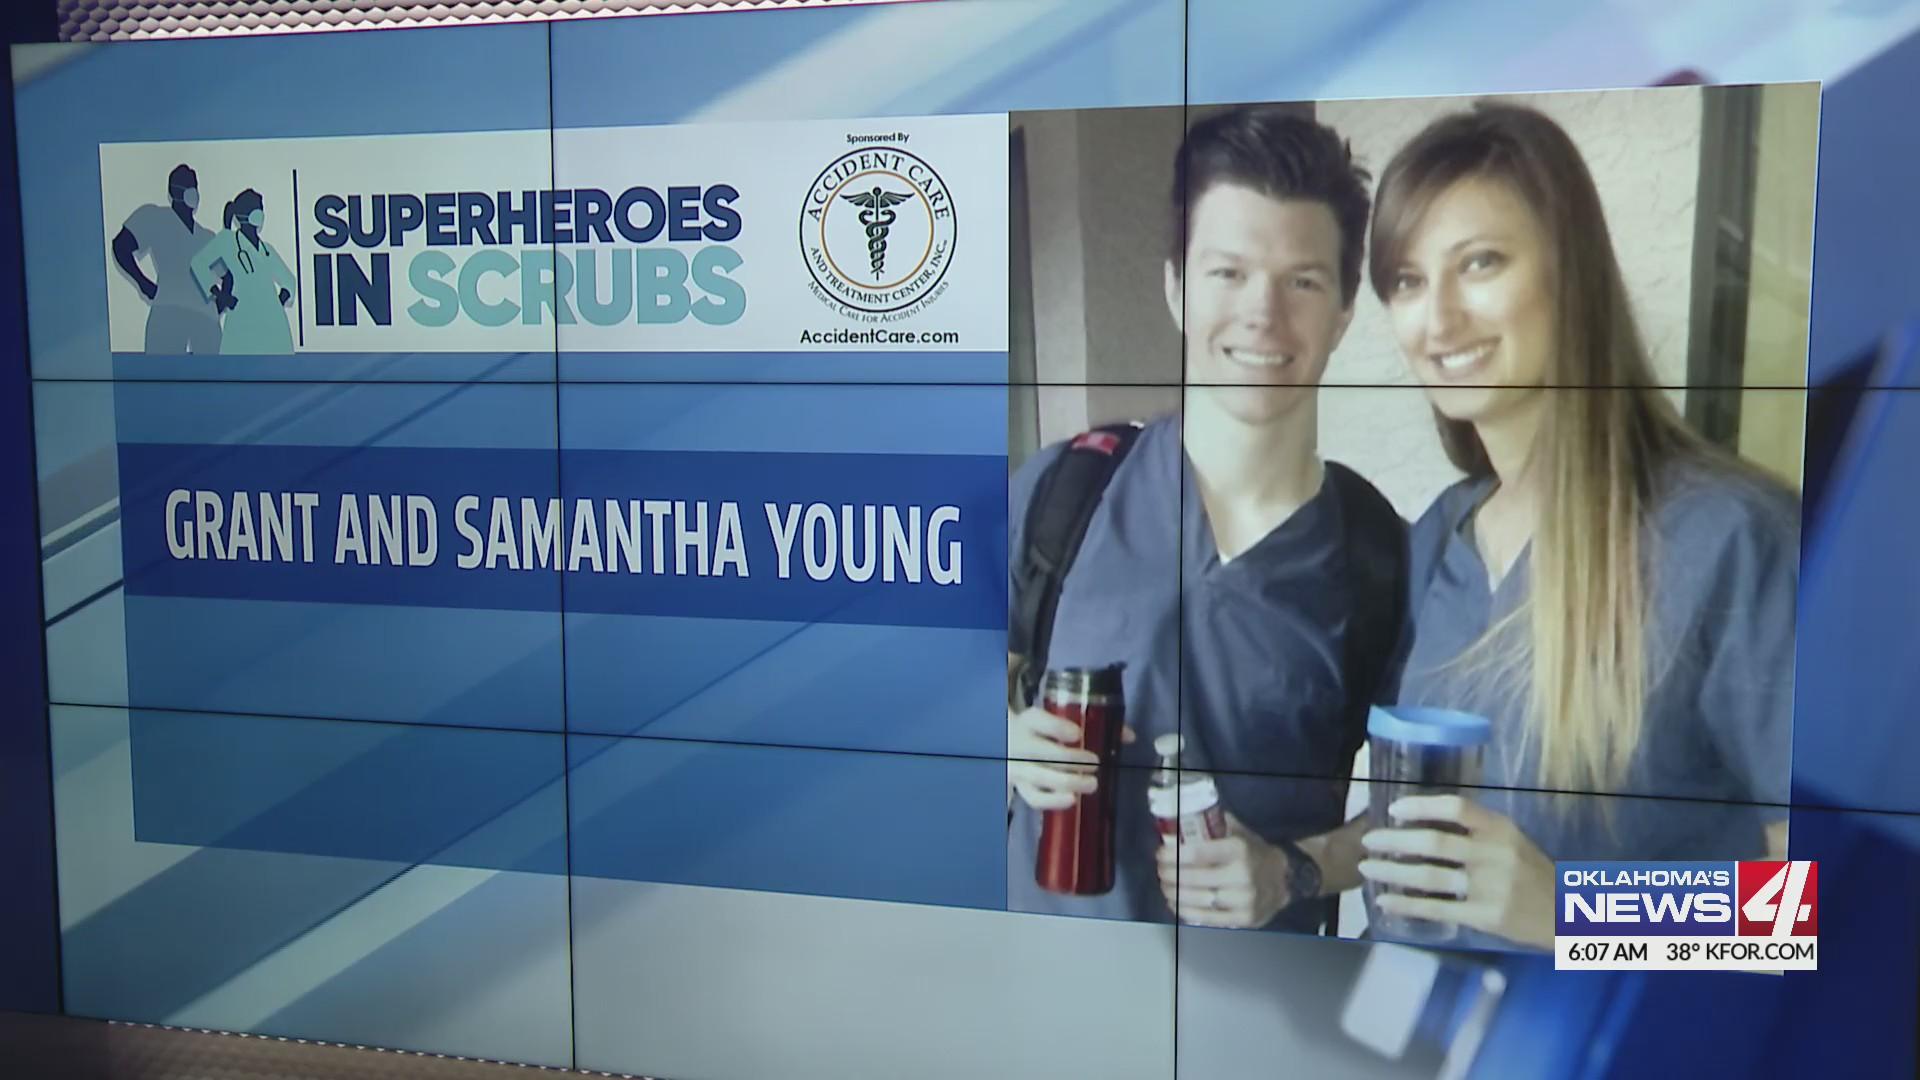 Grant and Samantha Young